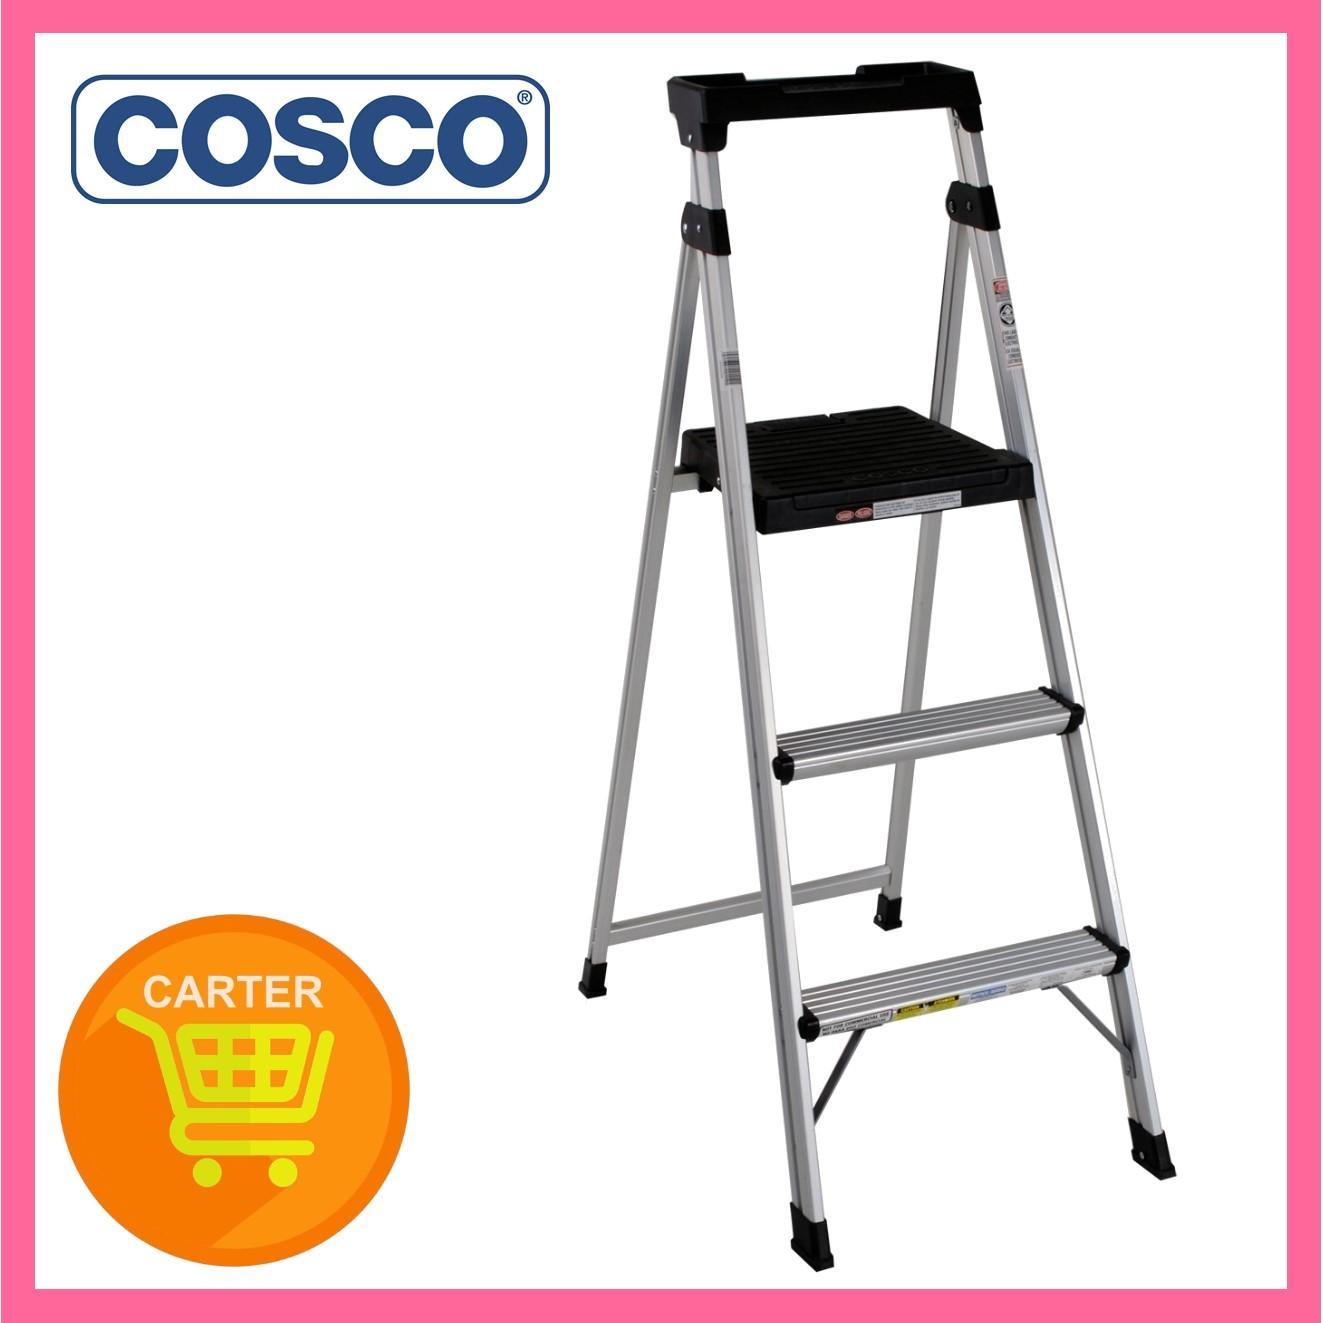 COSCO FOLDING STEP LITE SOLUTION LADDER SL5071